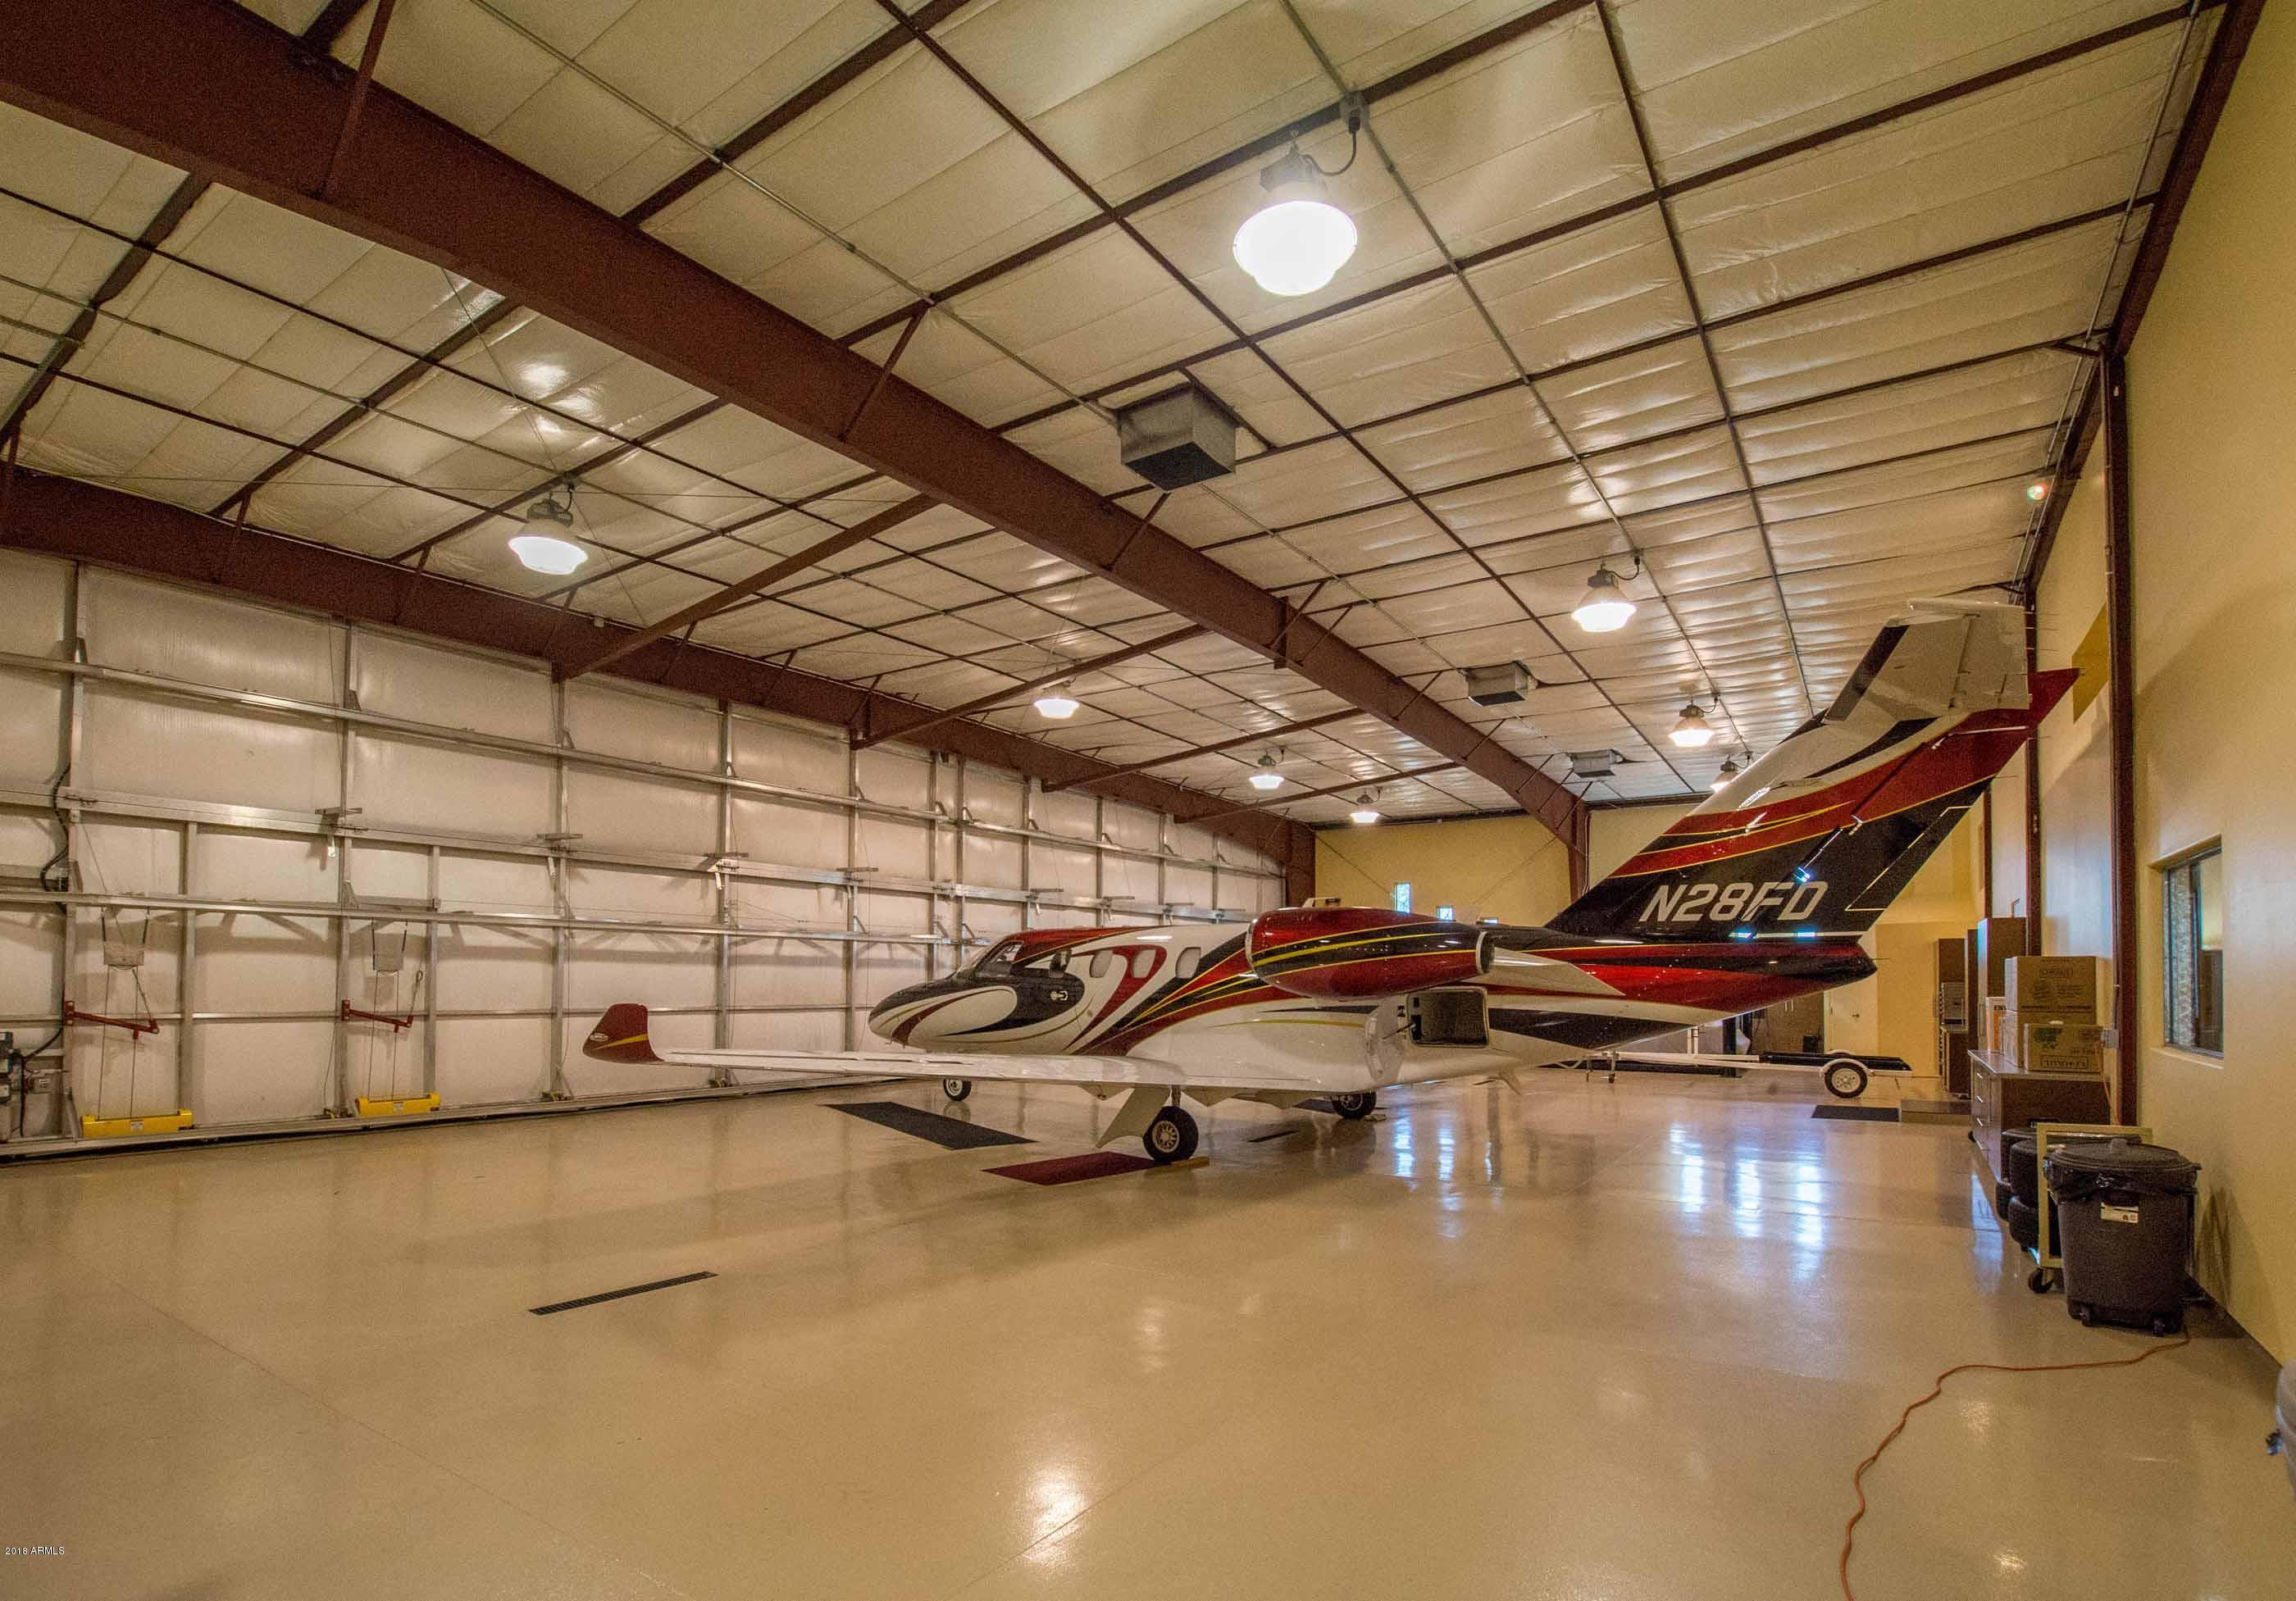 MLS 5704038 8360 E AUTOPLANE Drive, Carefree, AZ 85377 Carefree